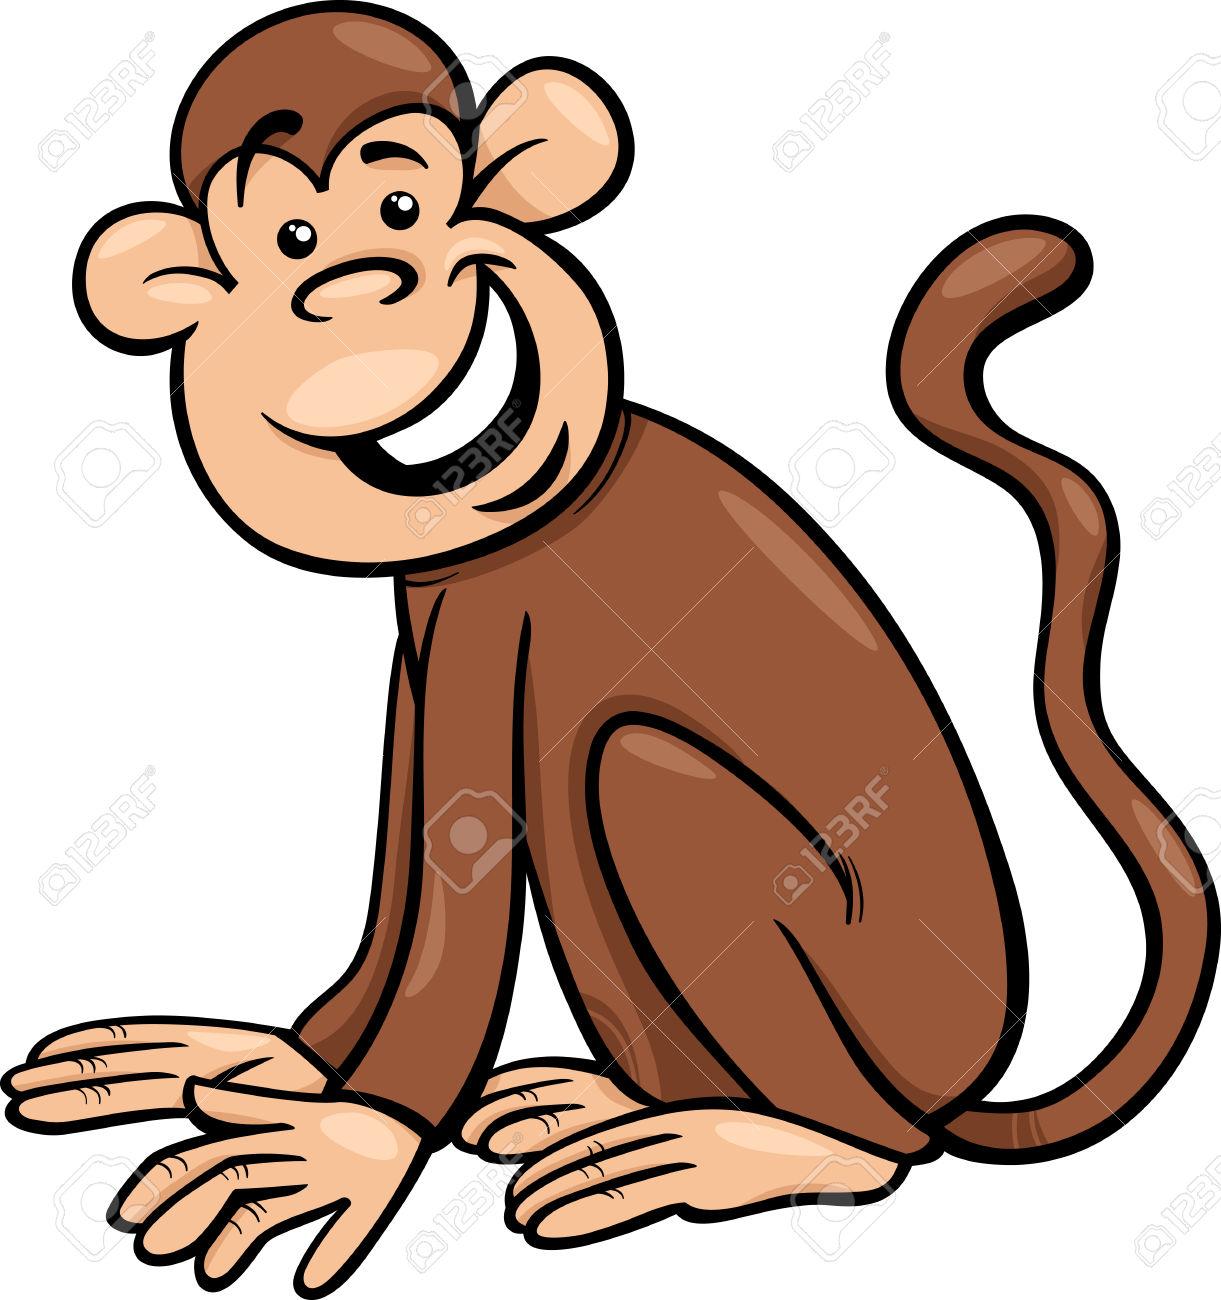 Primate clipart #6, Download drawings